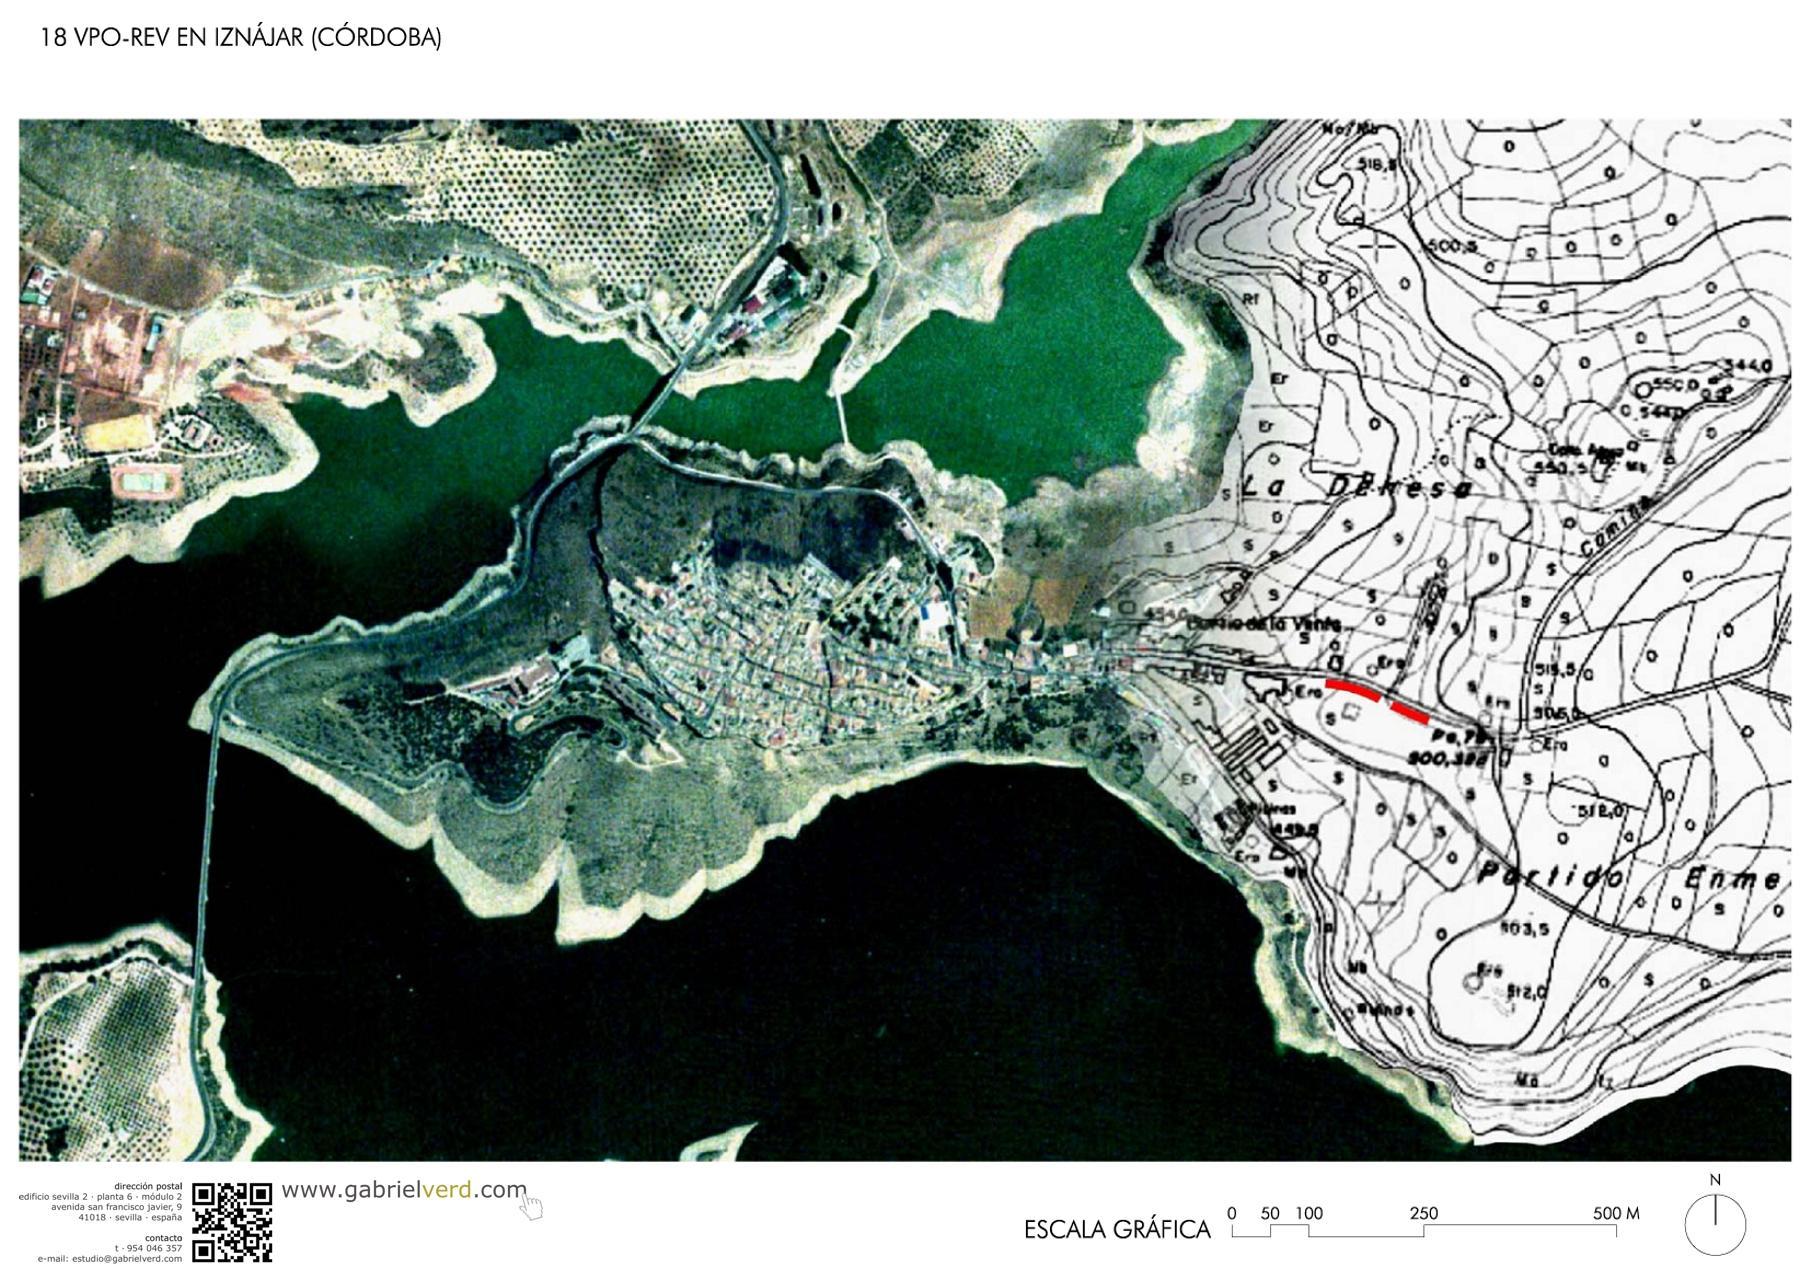 CORDOVA SOCIAL HOUSING LOCATION MAP